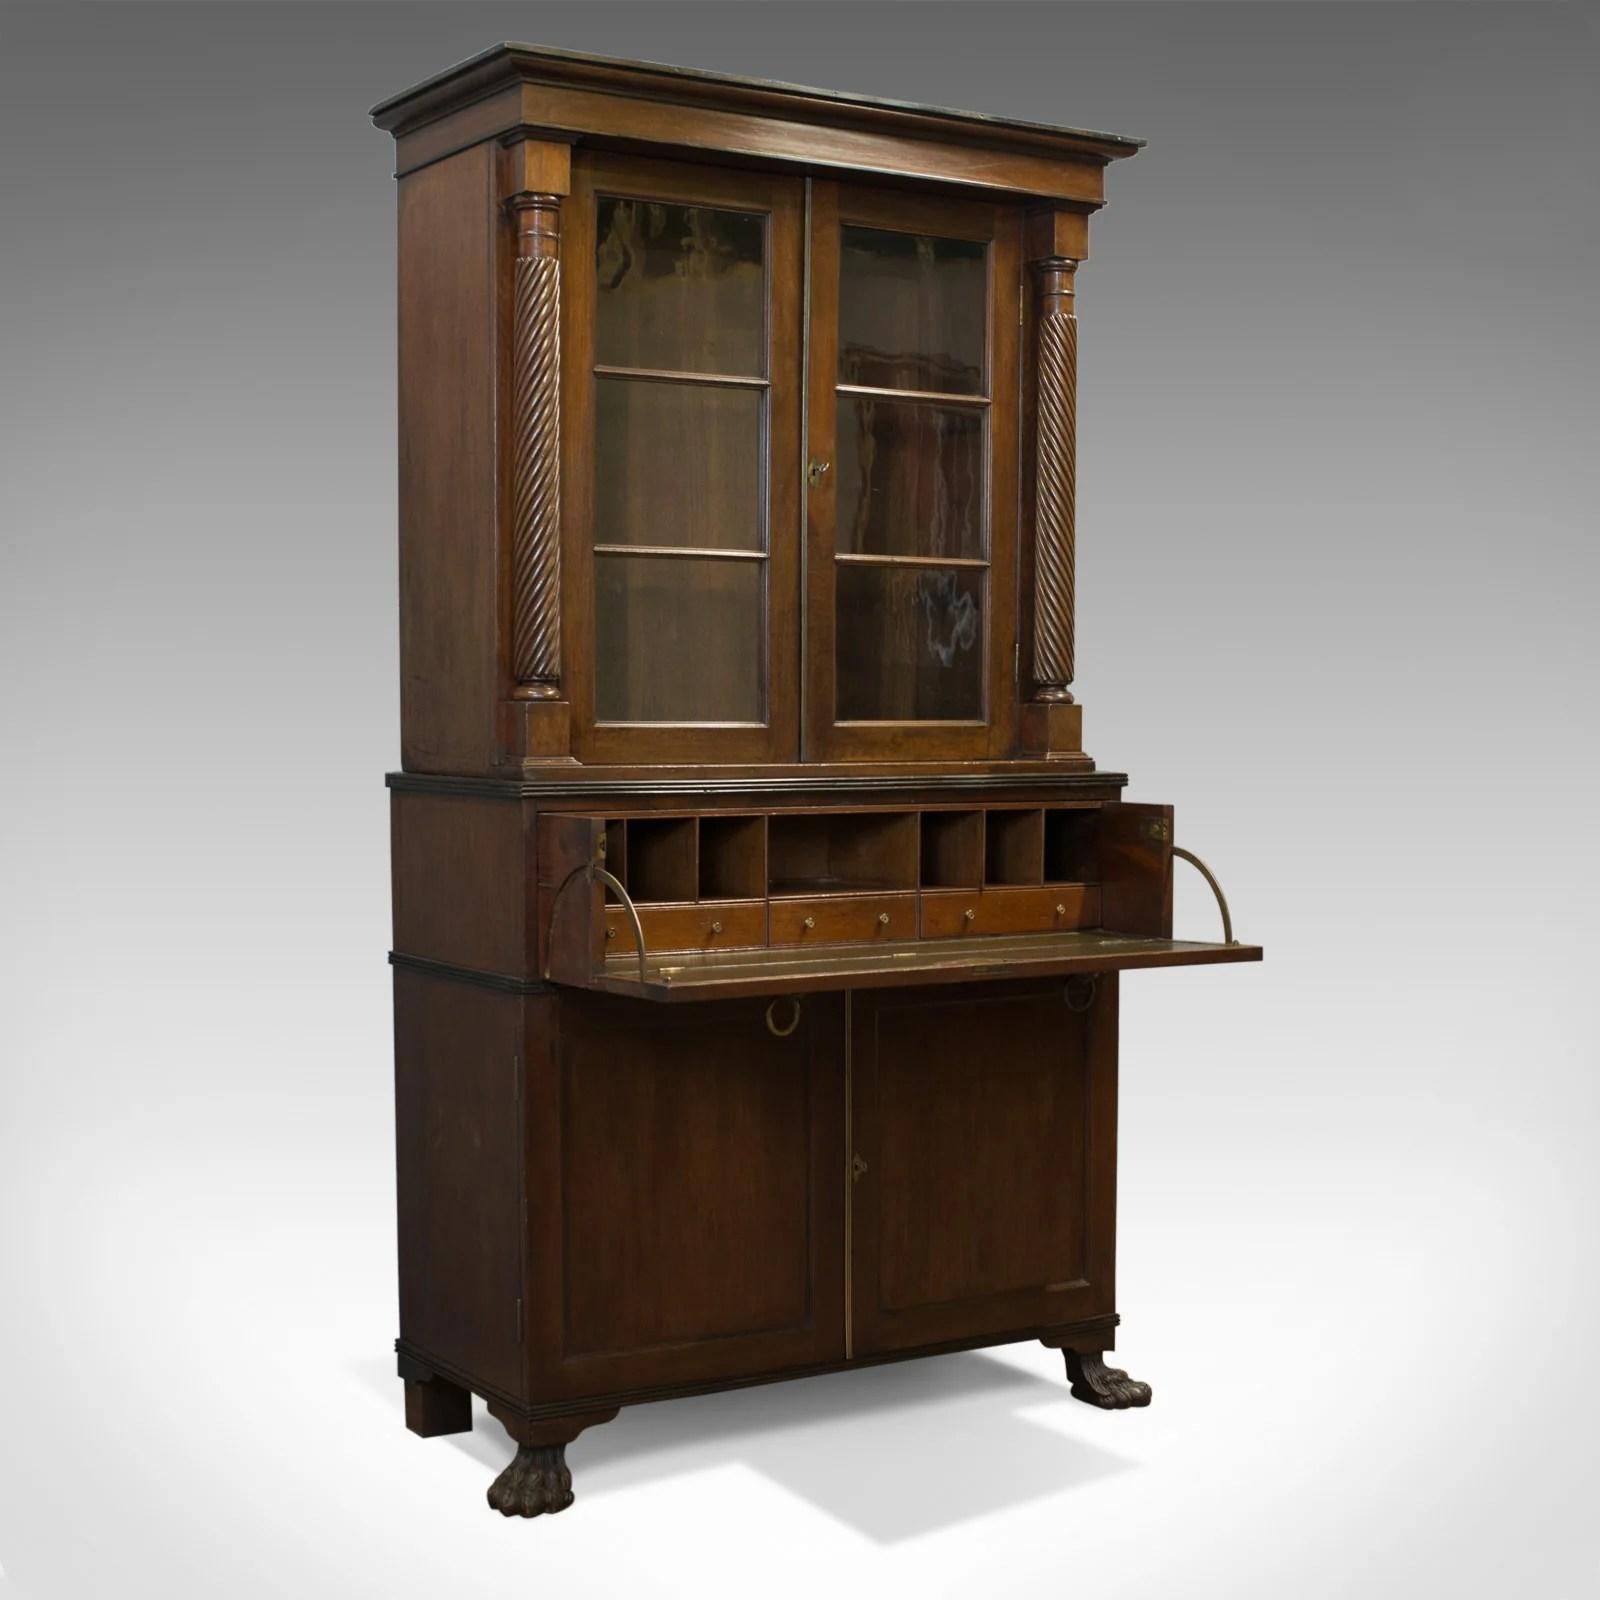 Details About Antique Secretaire Bookcase Scottish Mahogany Cabinet Victorian Circa 1880